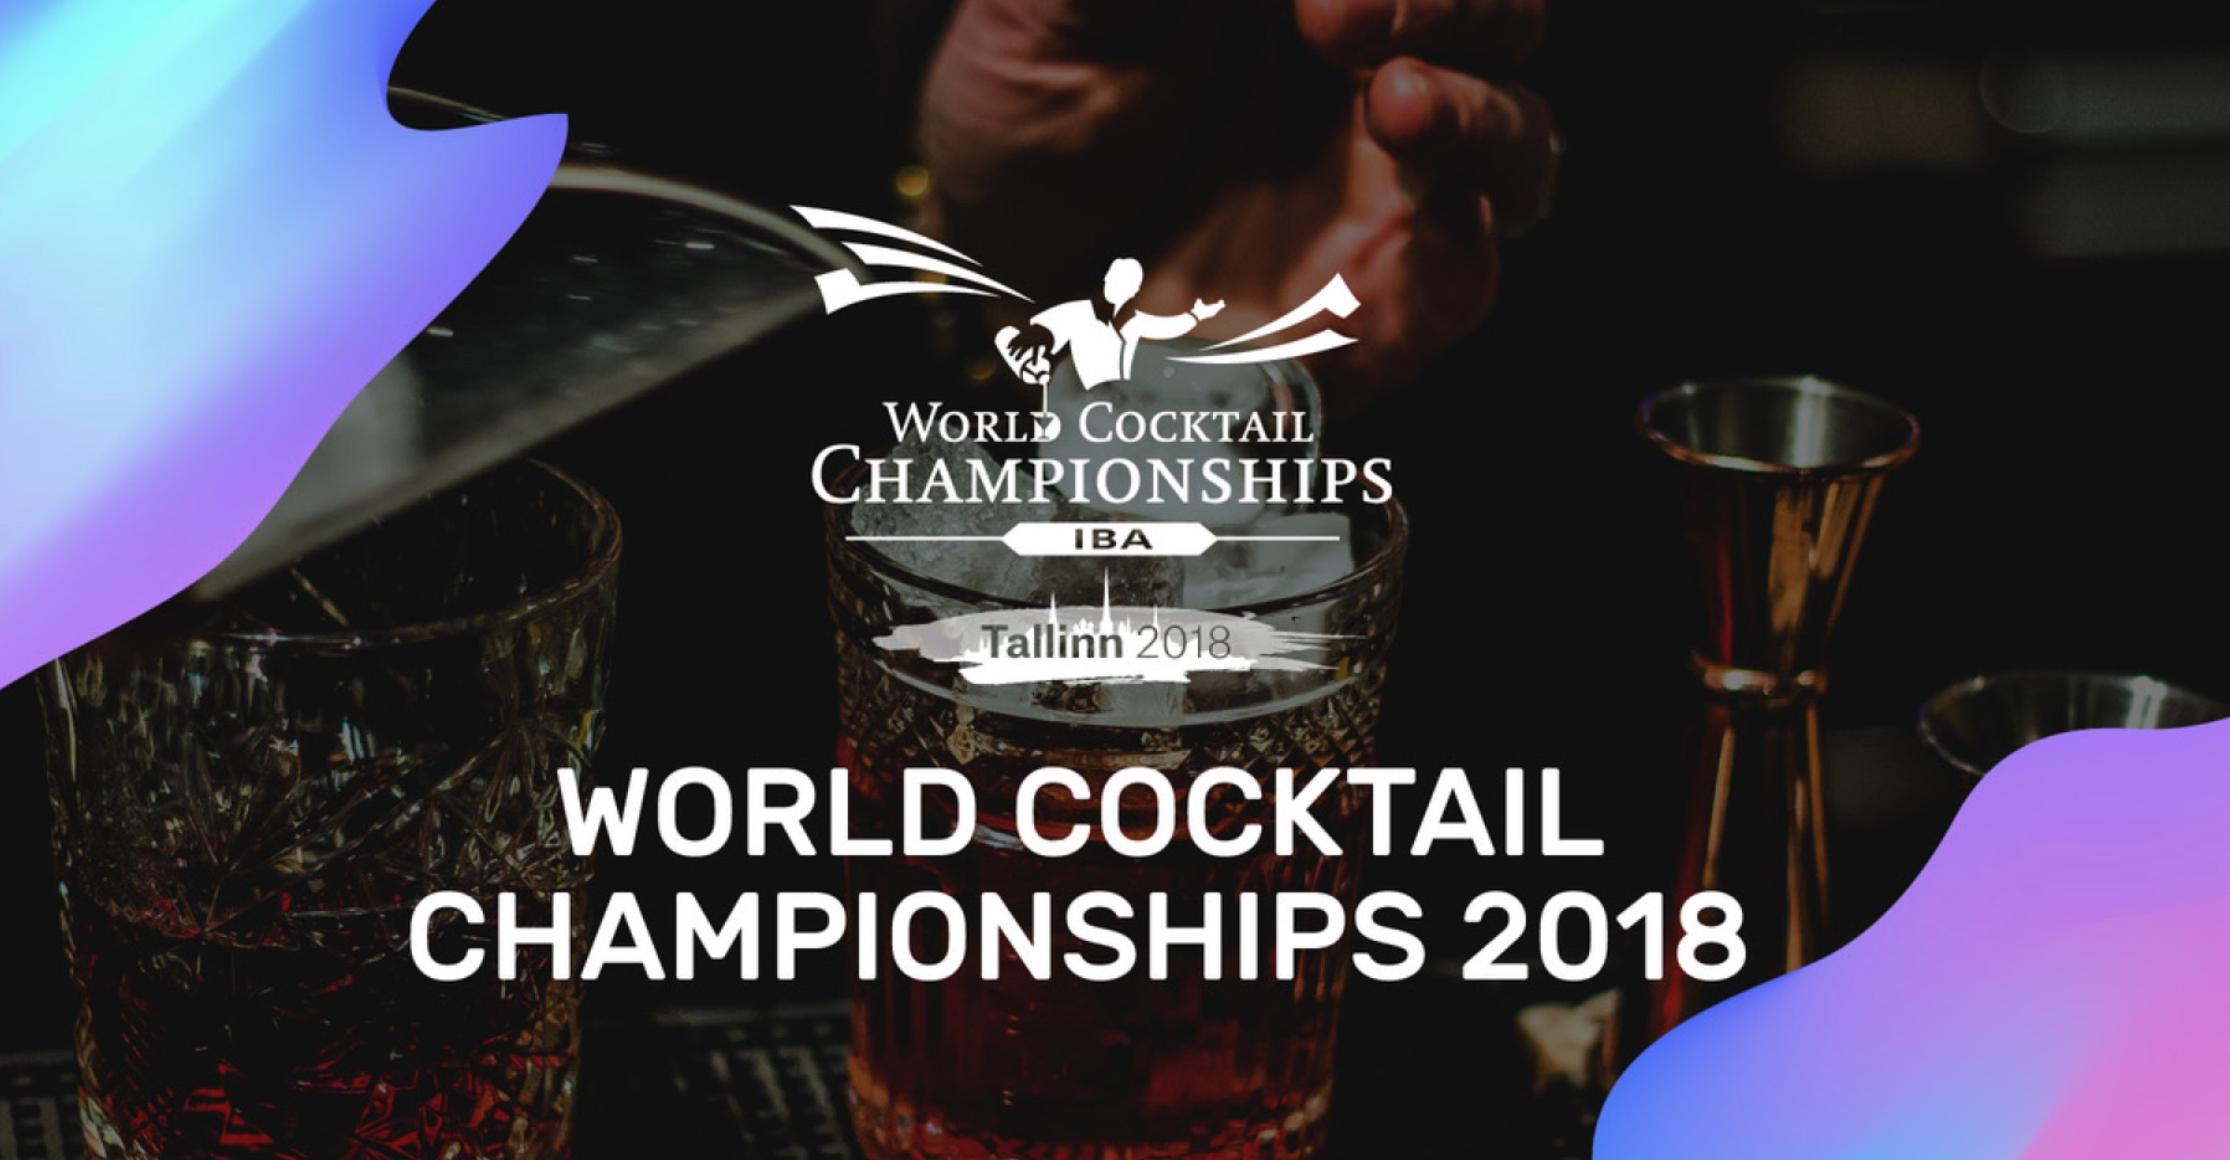 7032World Cocktail Championships Tallinn 2018